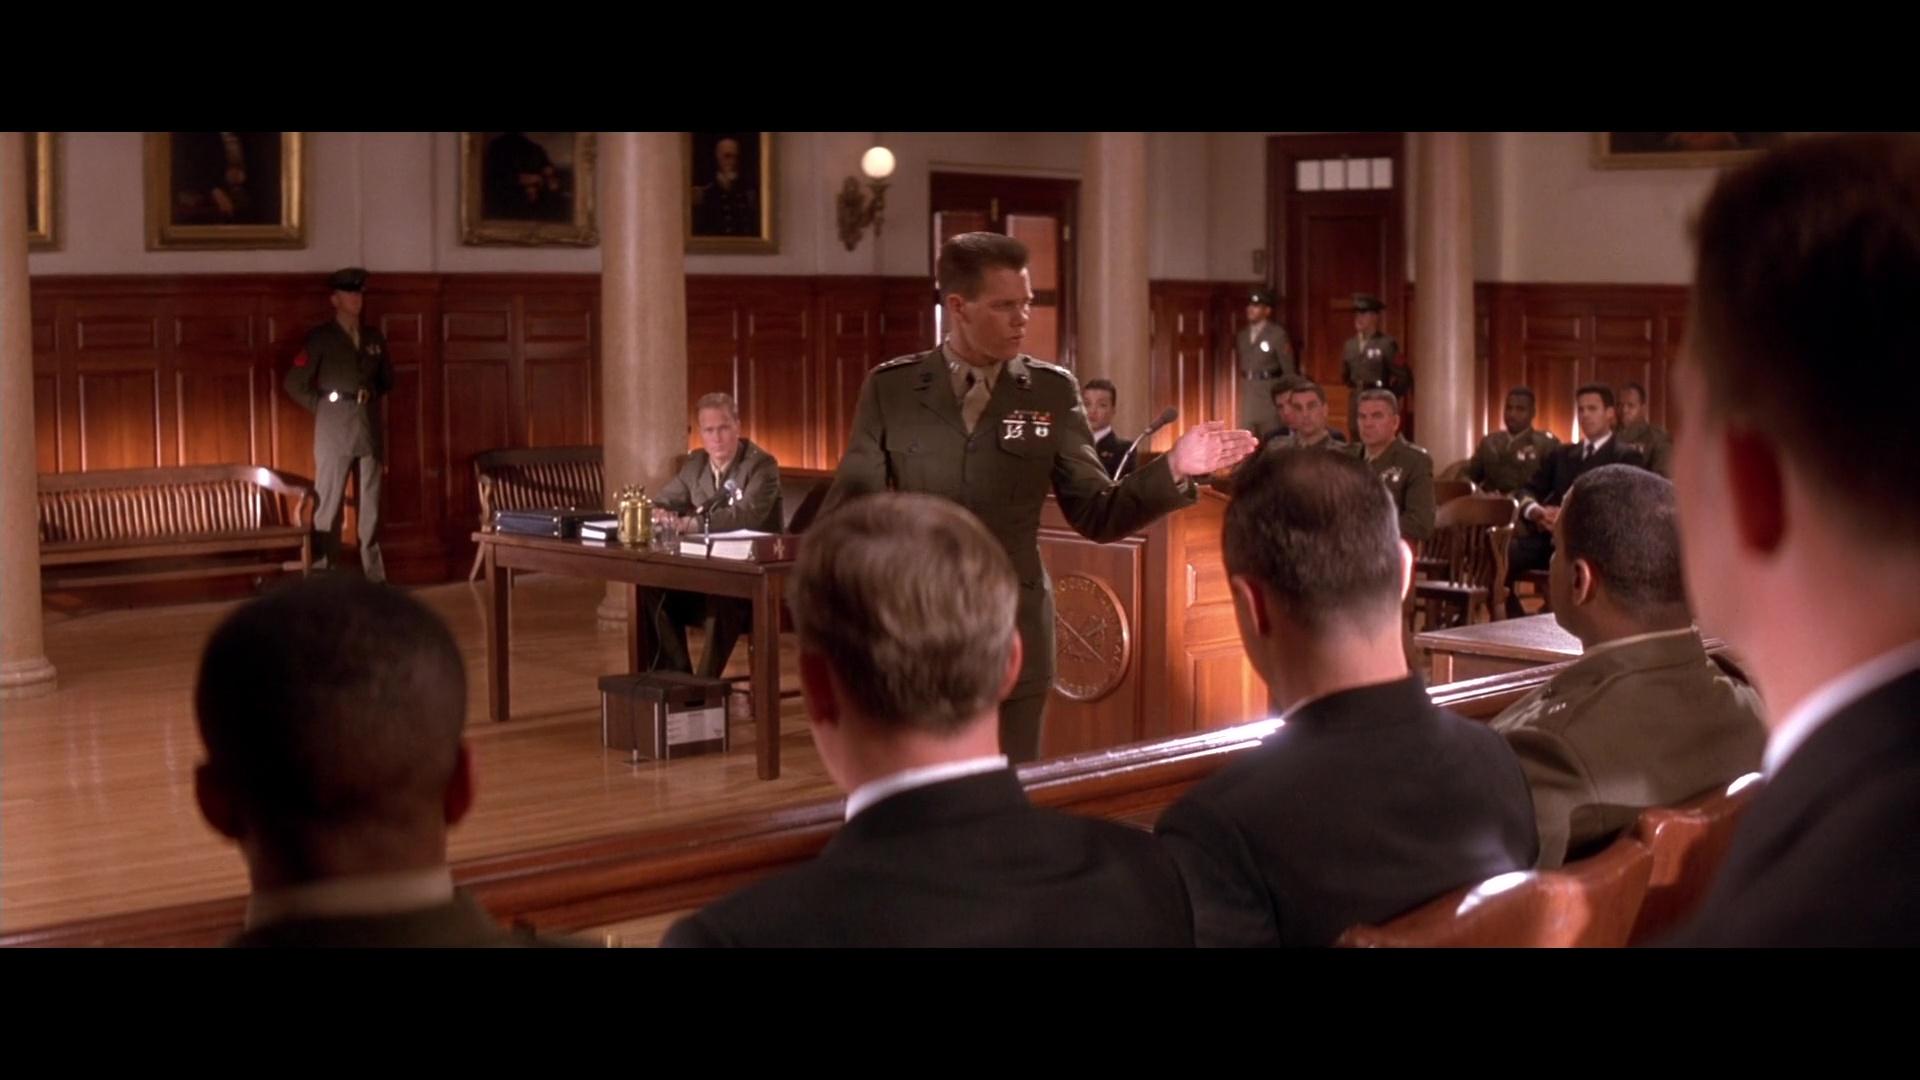 Cuestion De Honor 1080p Lat-Cast-Ing 5.1 (1992)